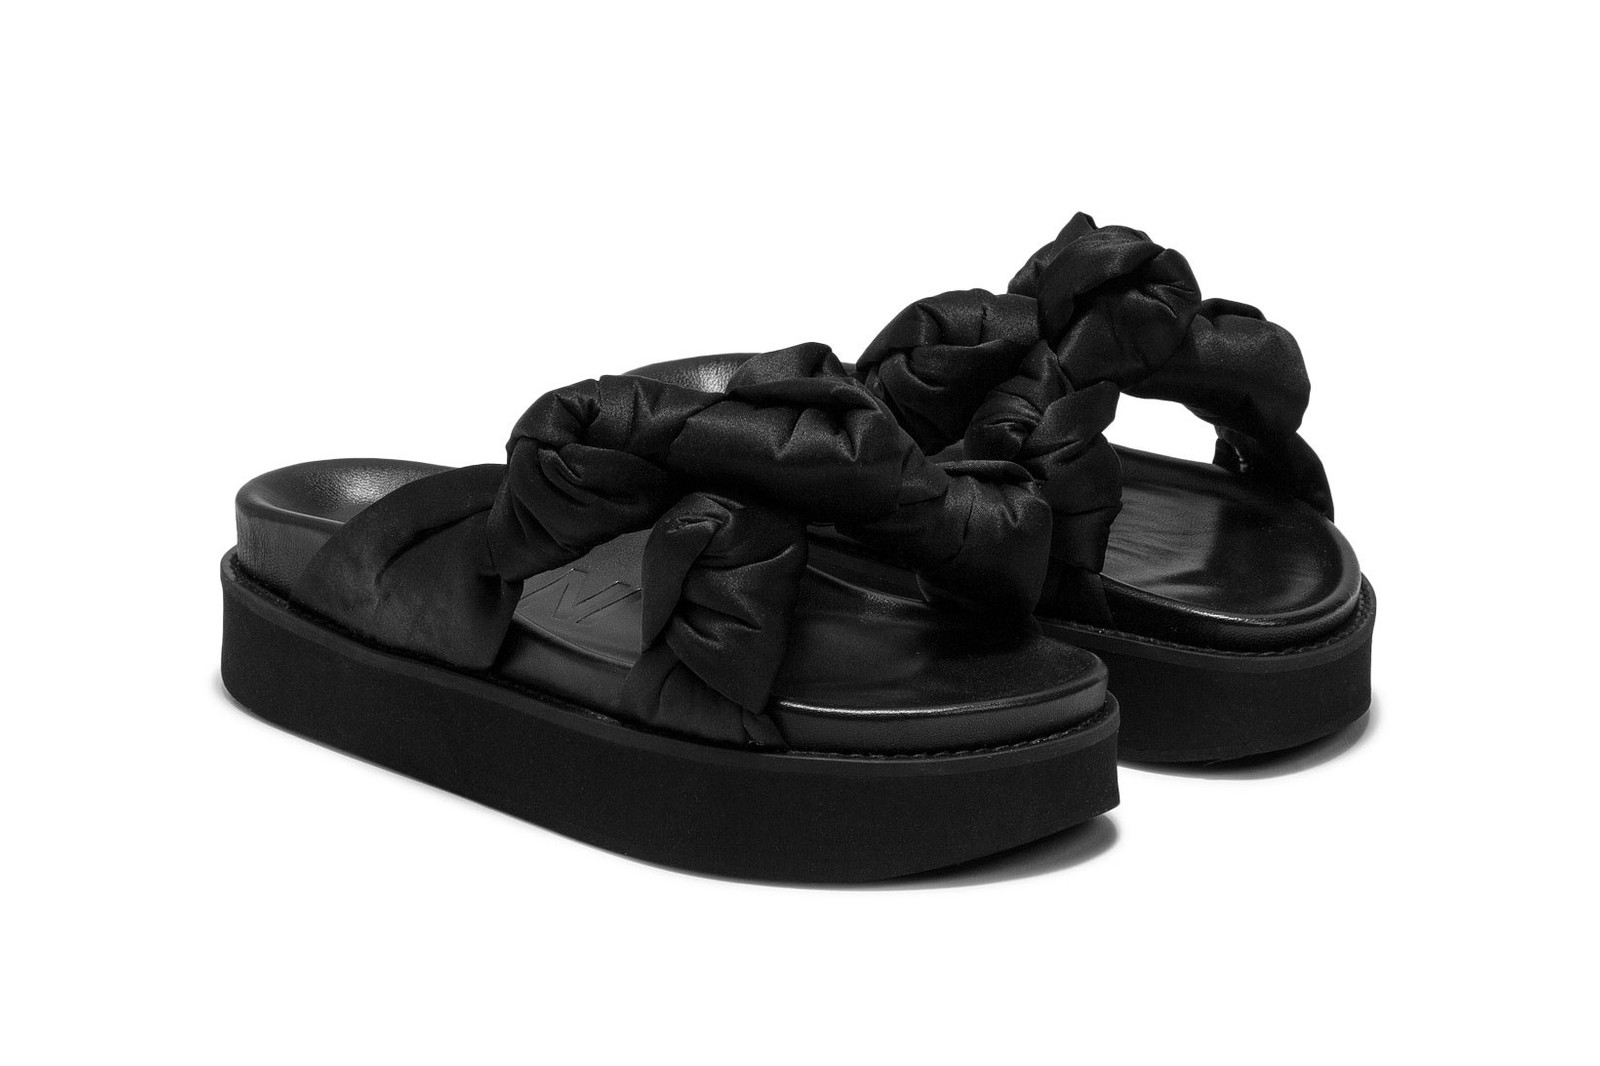 best summer sandals heels flip flops platform shoes lisa says gah amina muaddi hereu